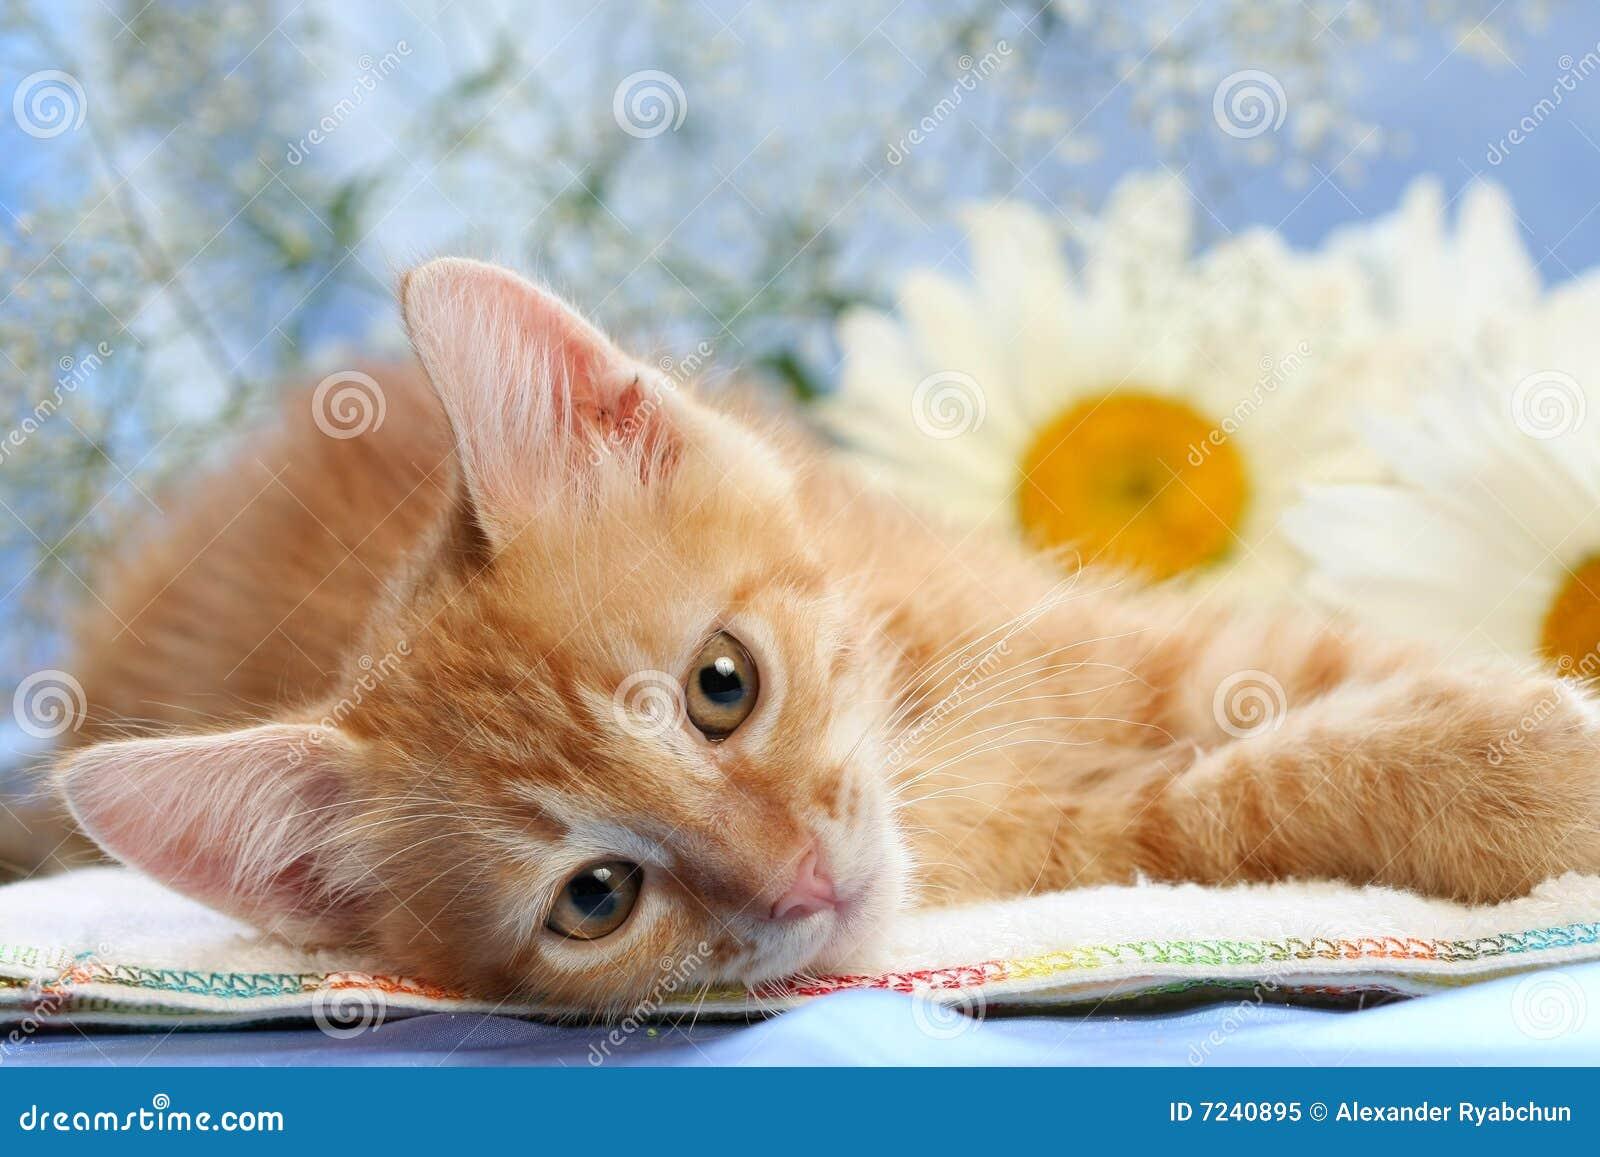 Camomiles小猫讨人喜欢小